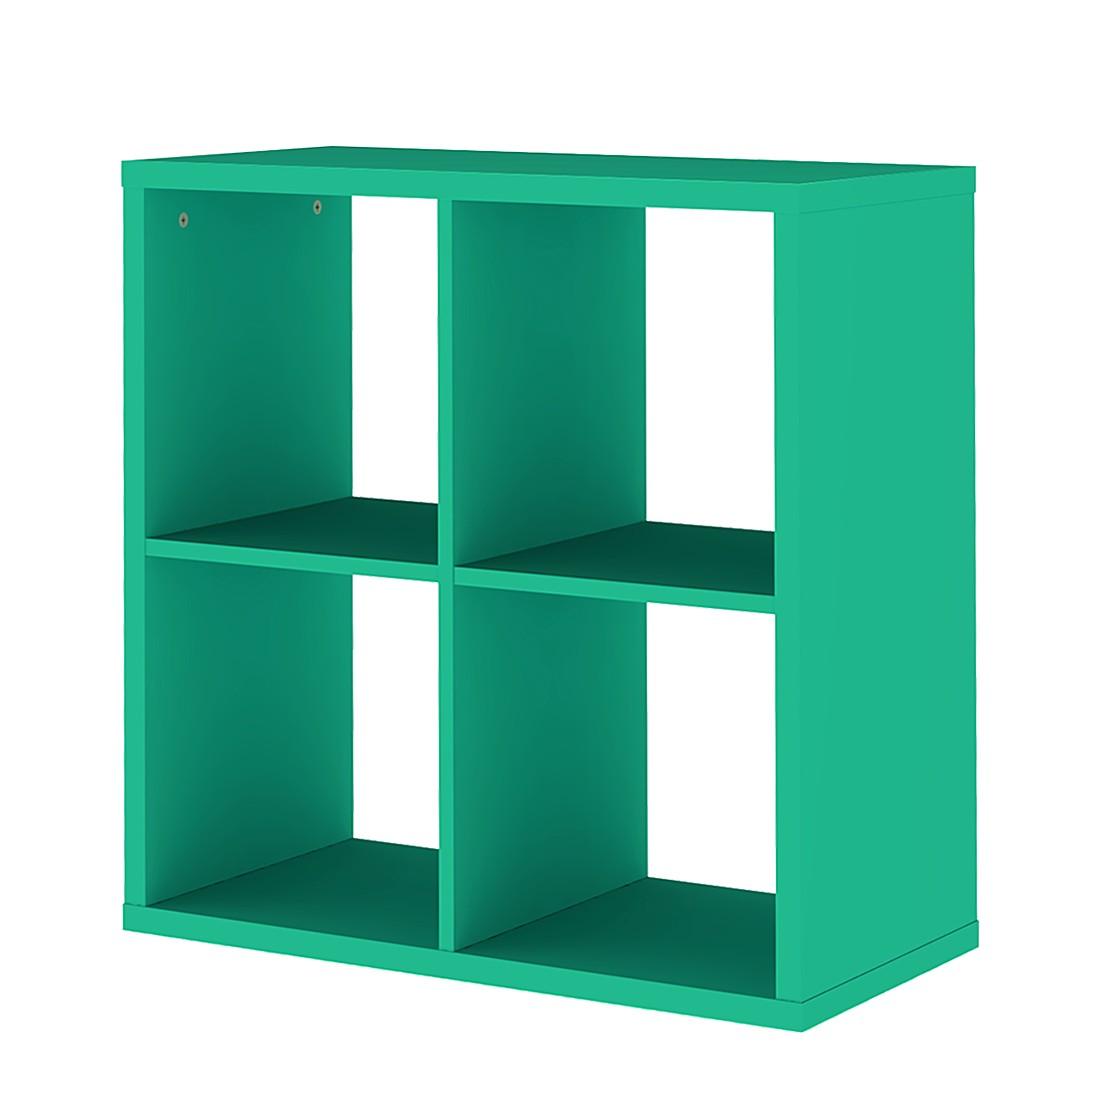 regal viereckig box gr n tenzo online kaufen. Black Bedroom Furniture Sets. Home Design Ideas